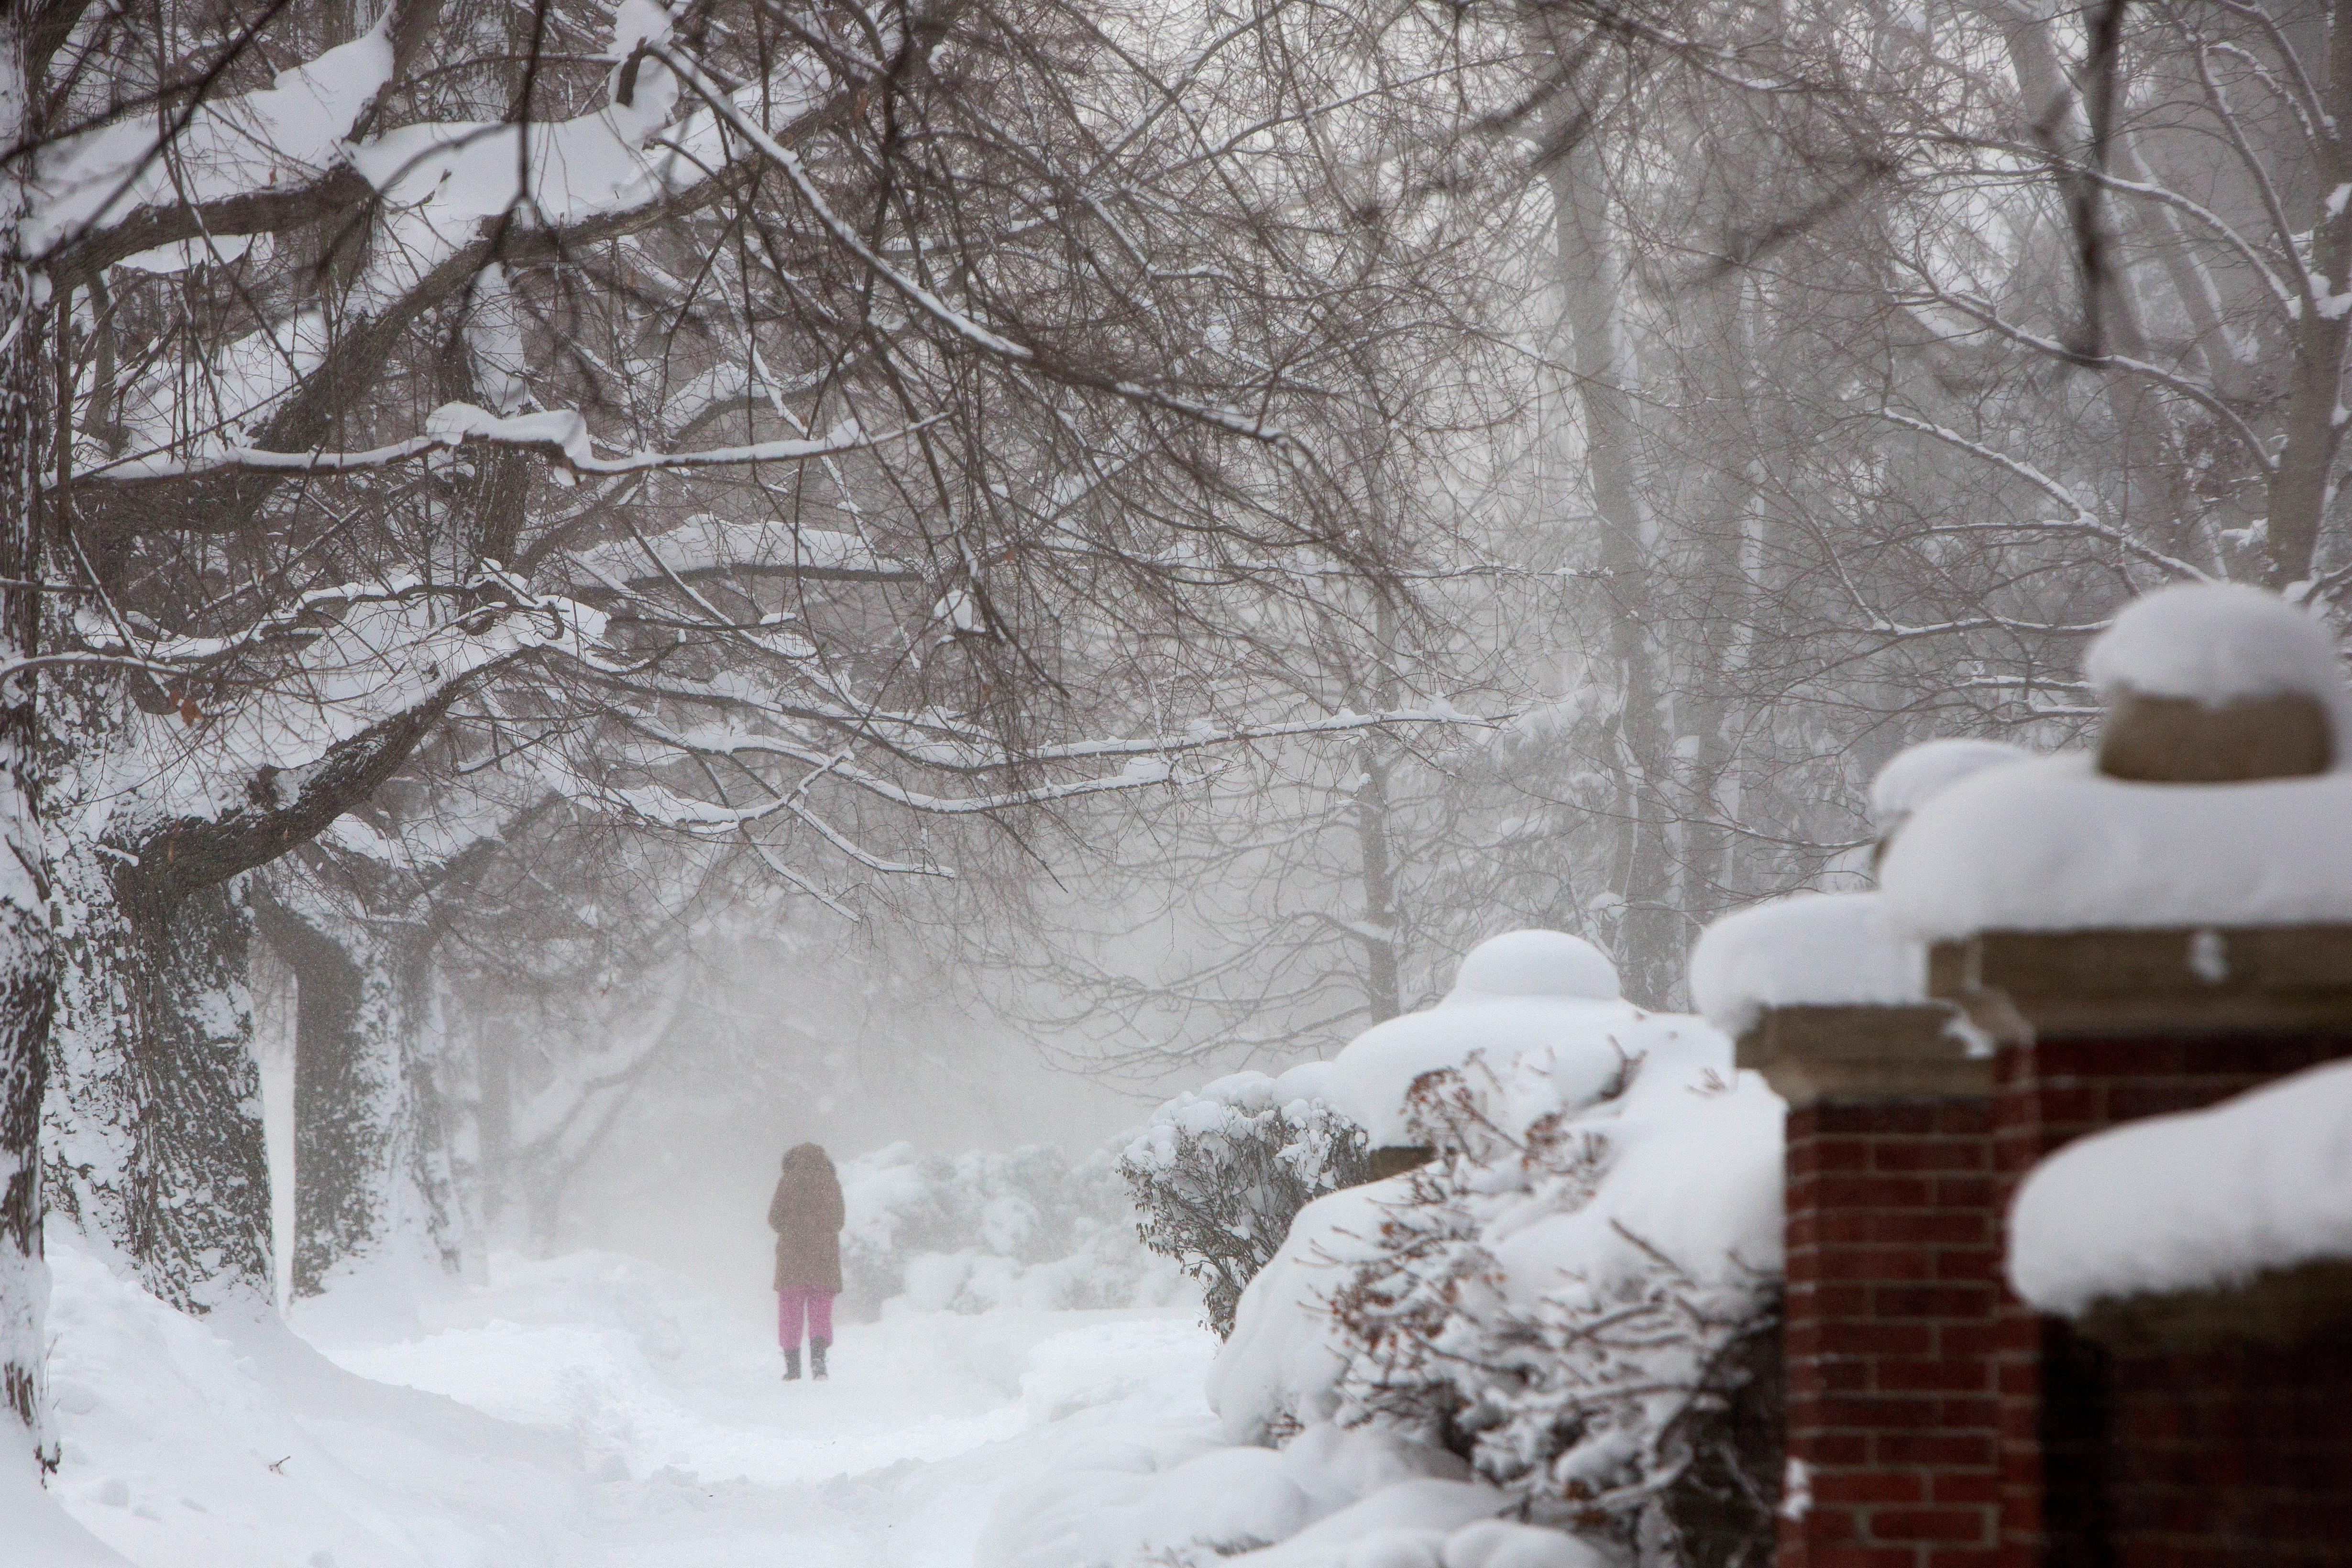 pedestrian walks through a snow storm